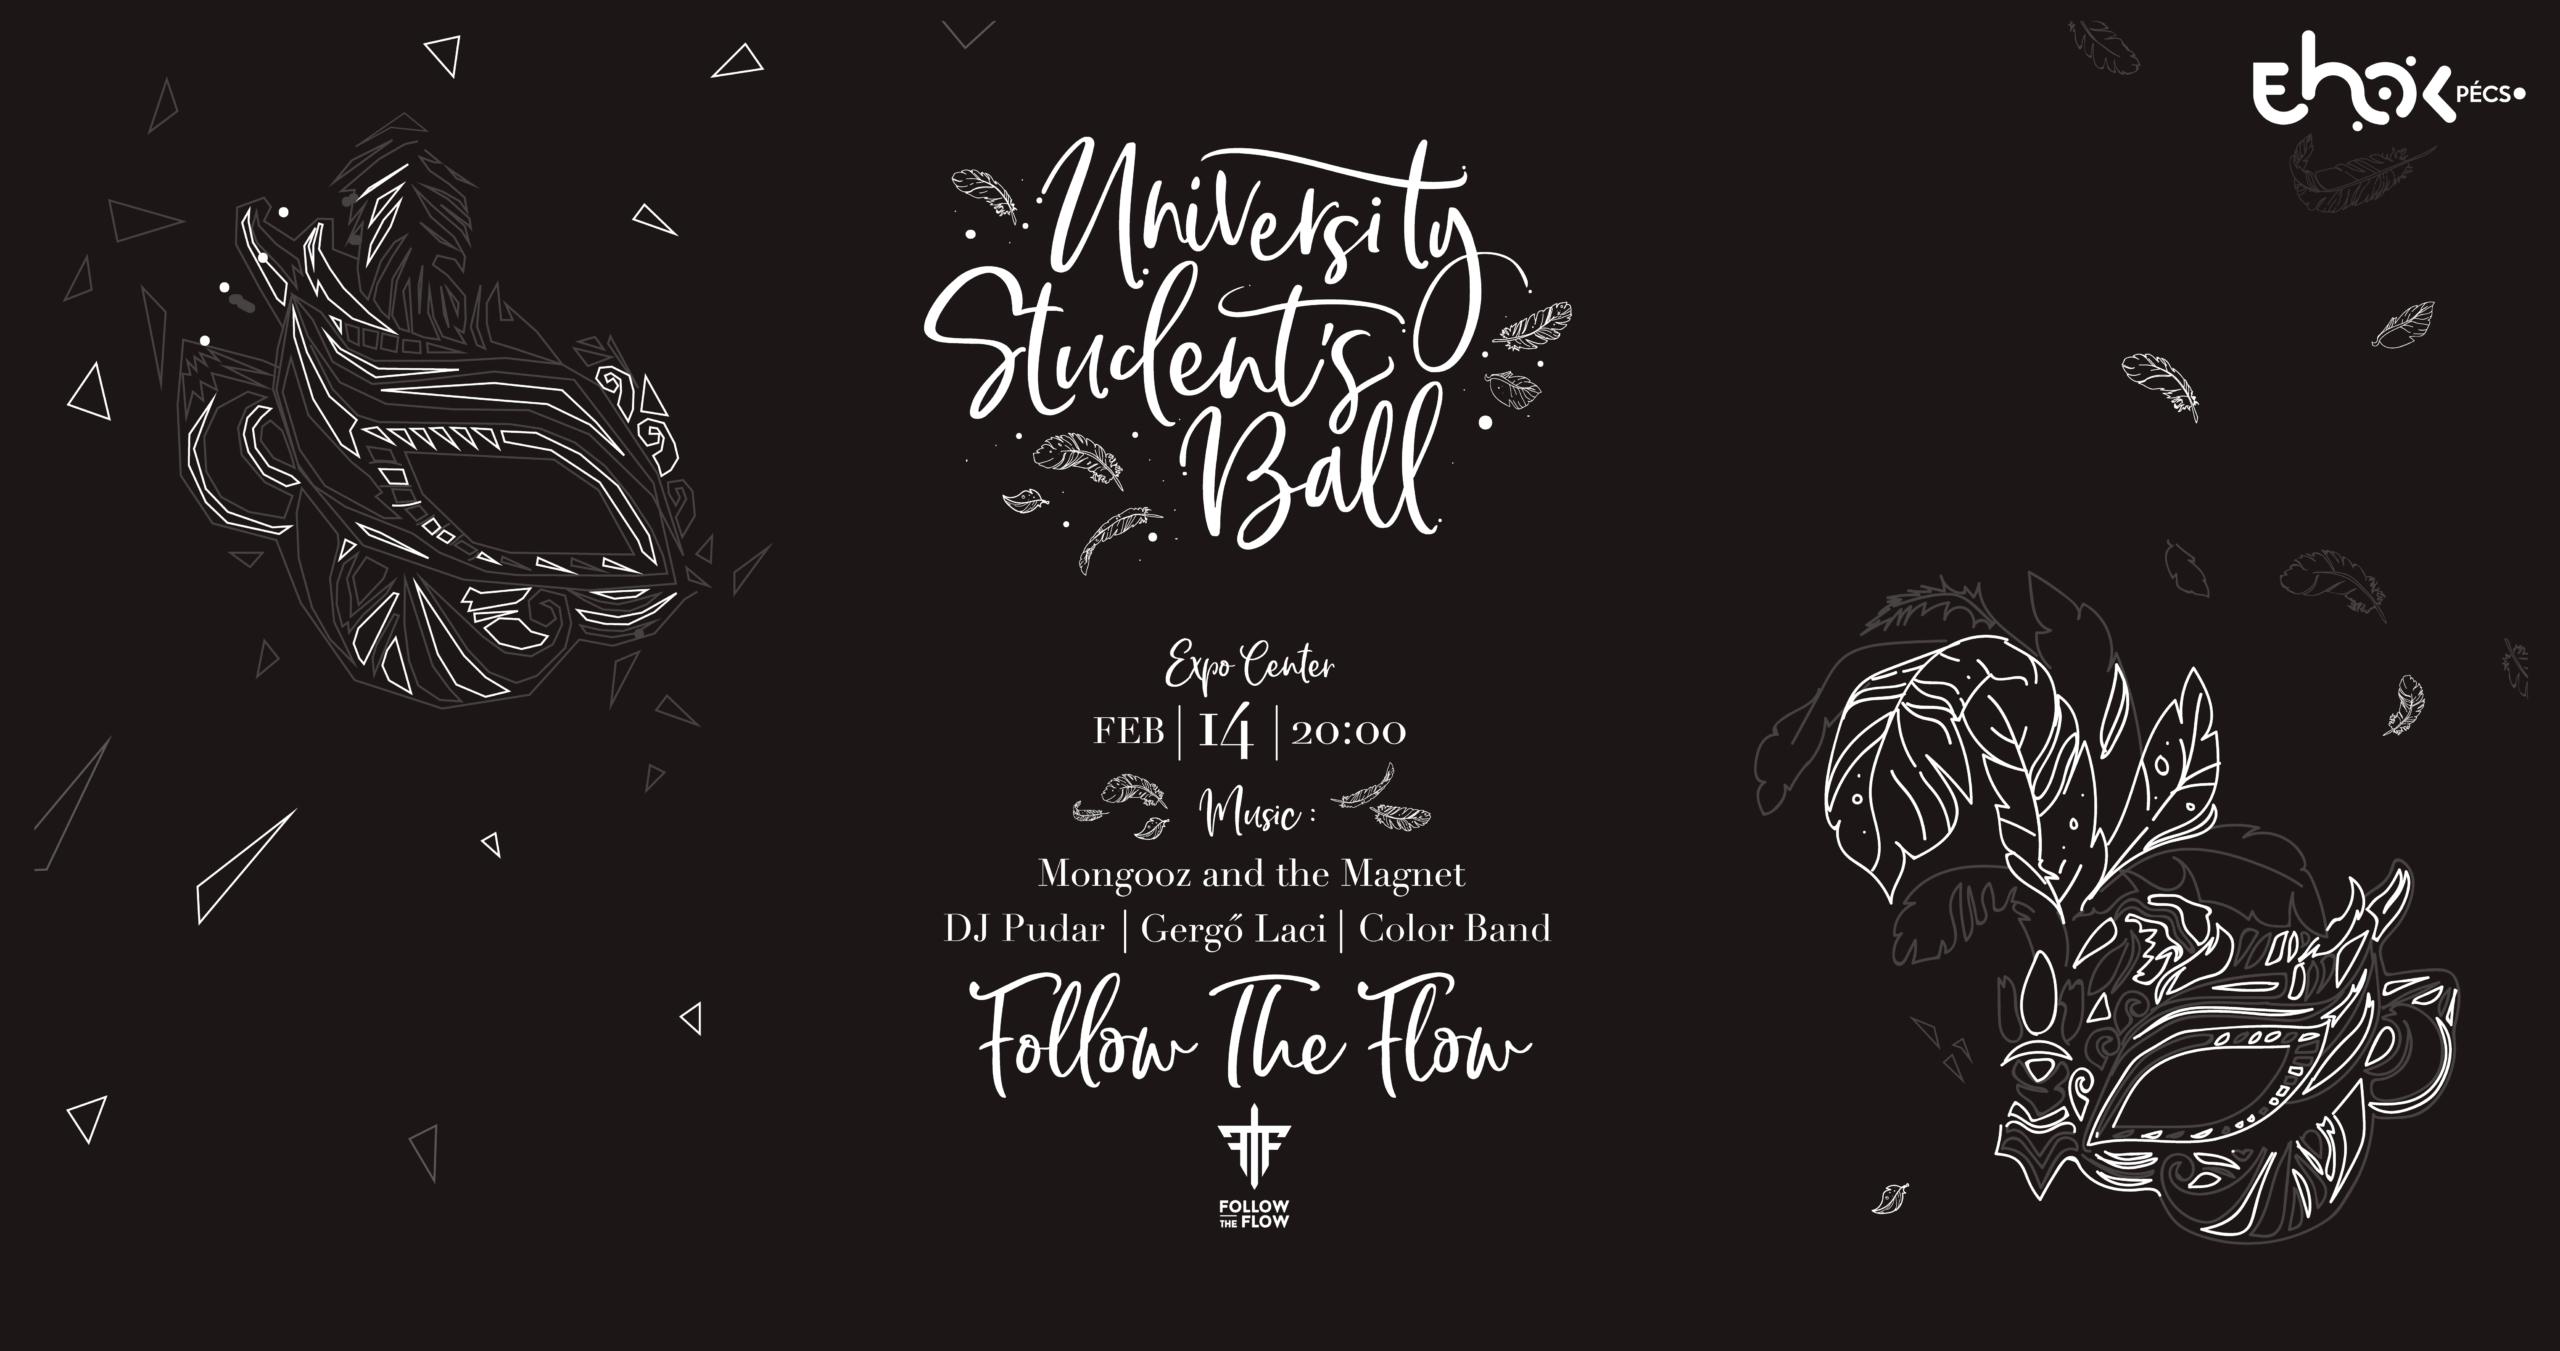 PTE University Student's Ball 2020 ✘ Follow The Flow 02.14.